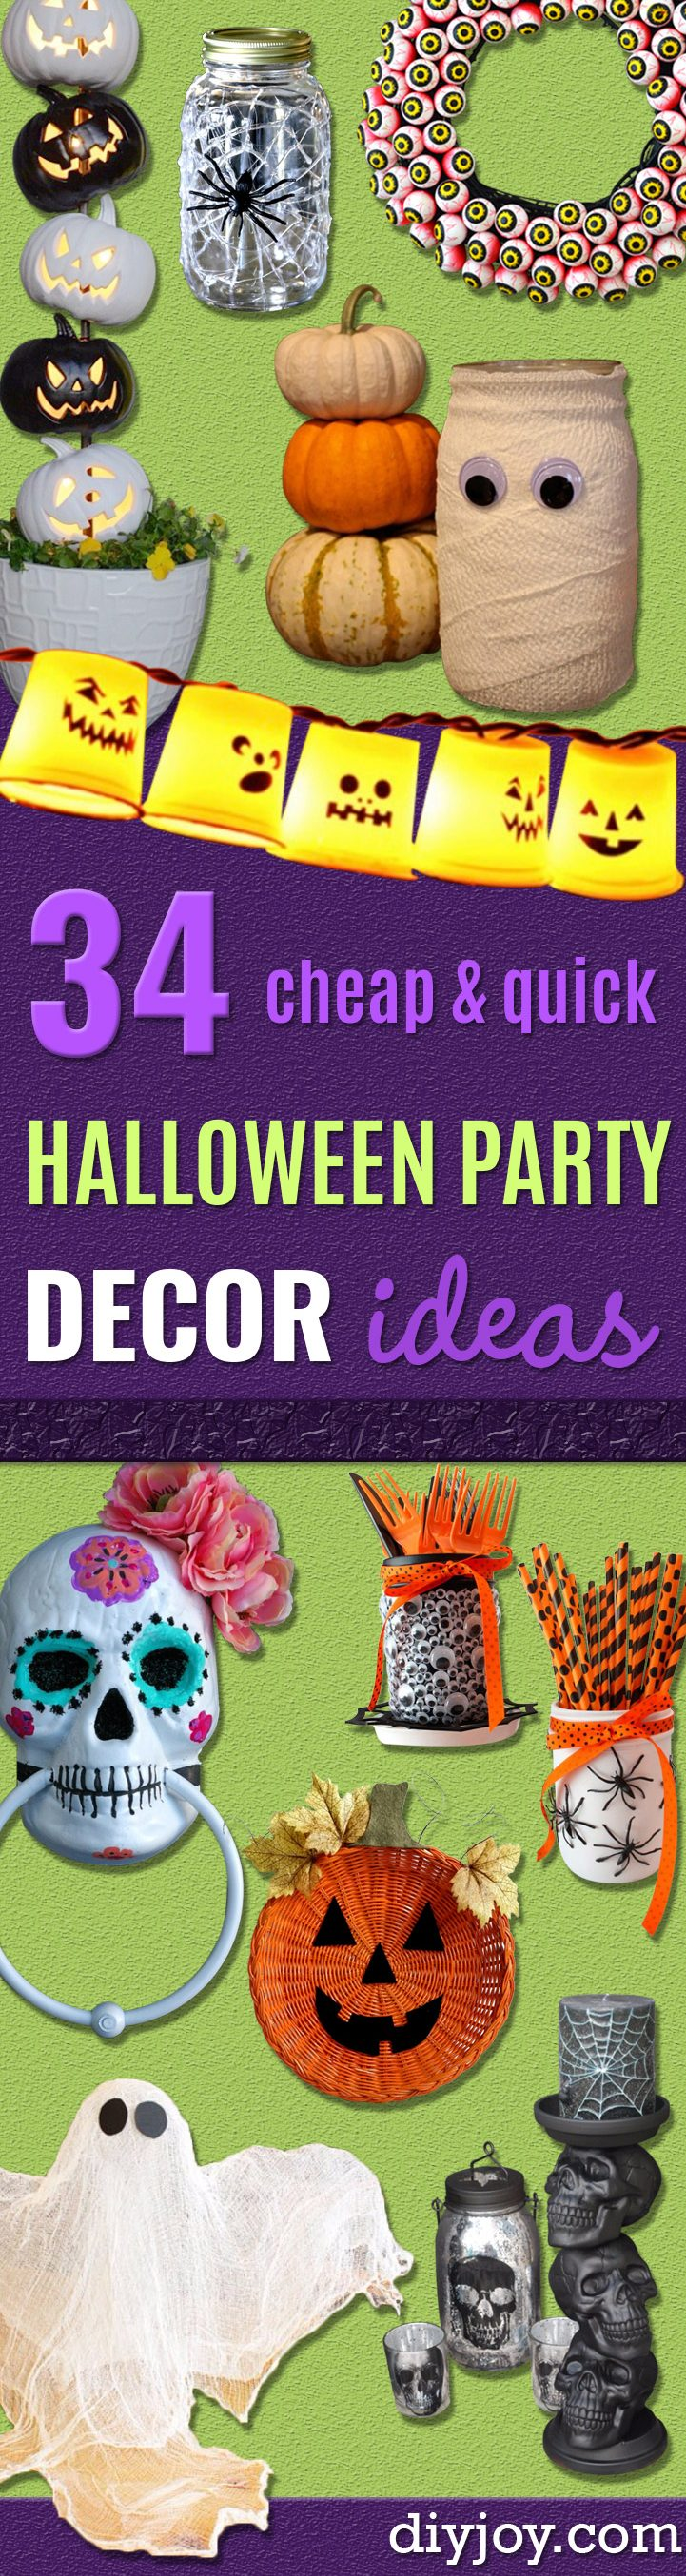 34 Inexpensive DIY Halloween Party Decor Ideas